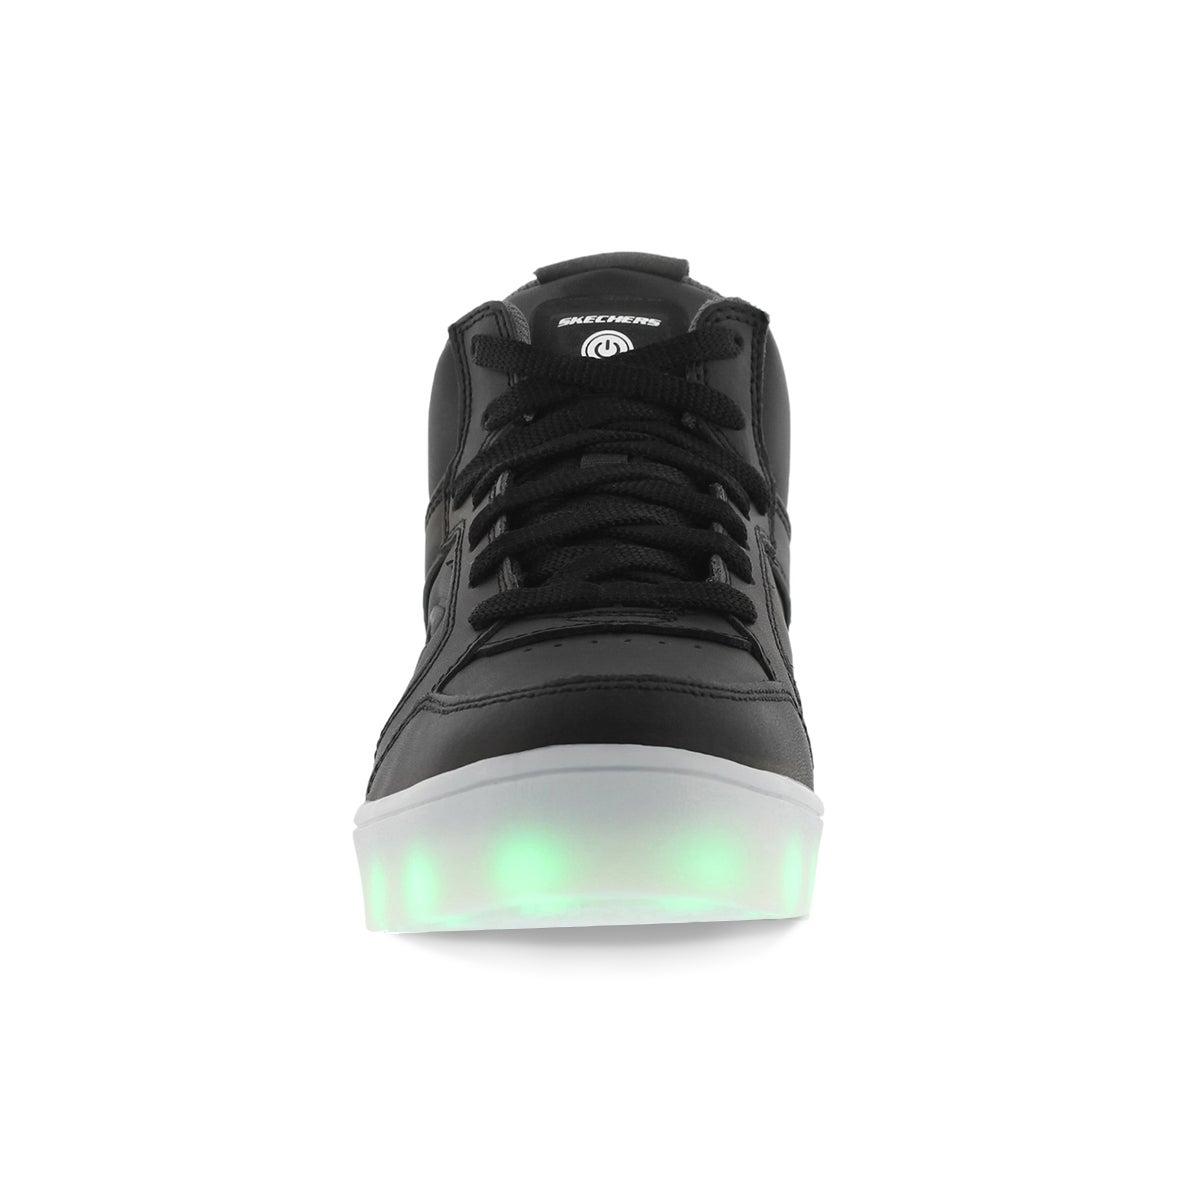 Skechers Energy Lights Boys Sneaker Hi Top Black Youth Sizes 90600l Light up 6